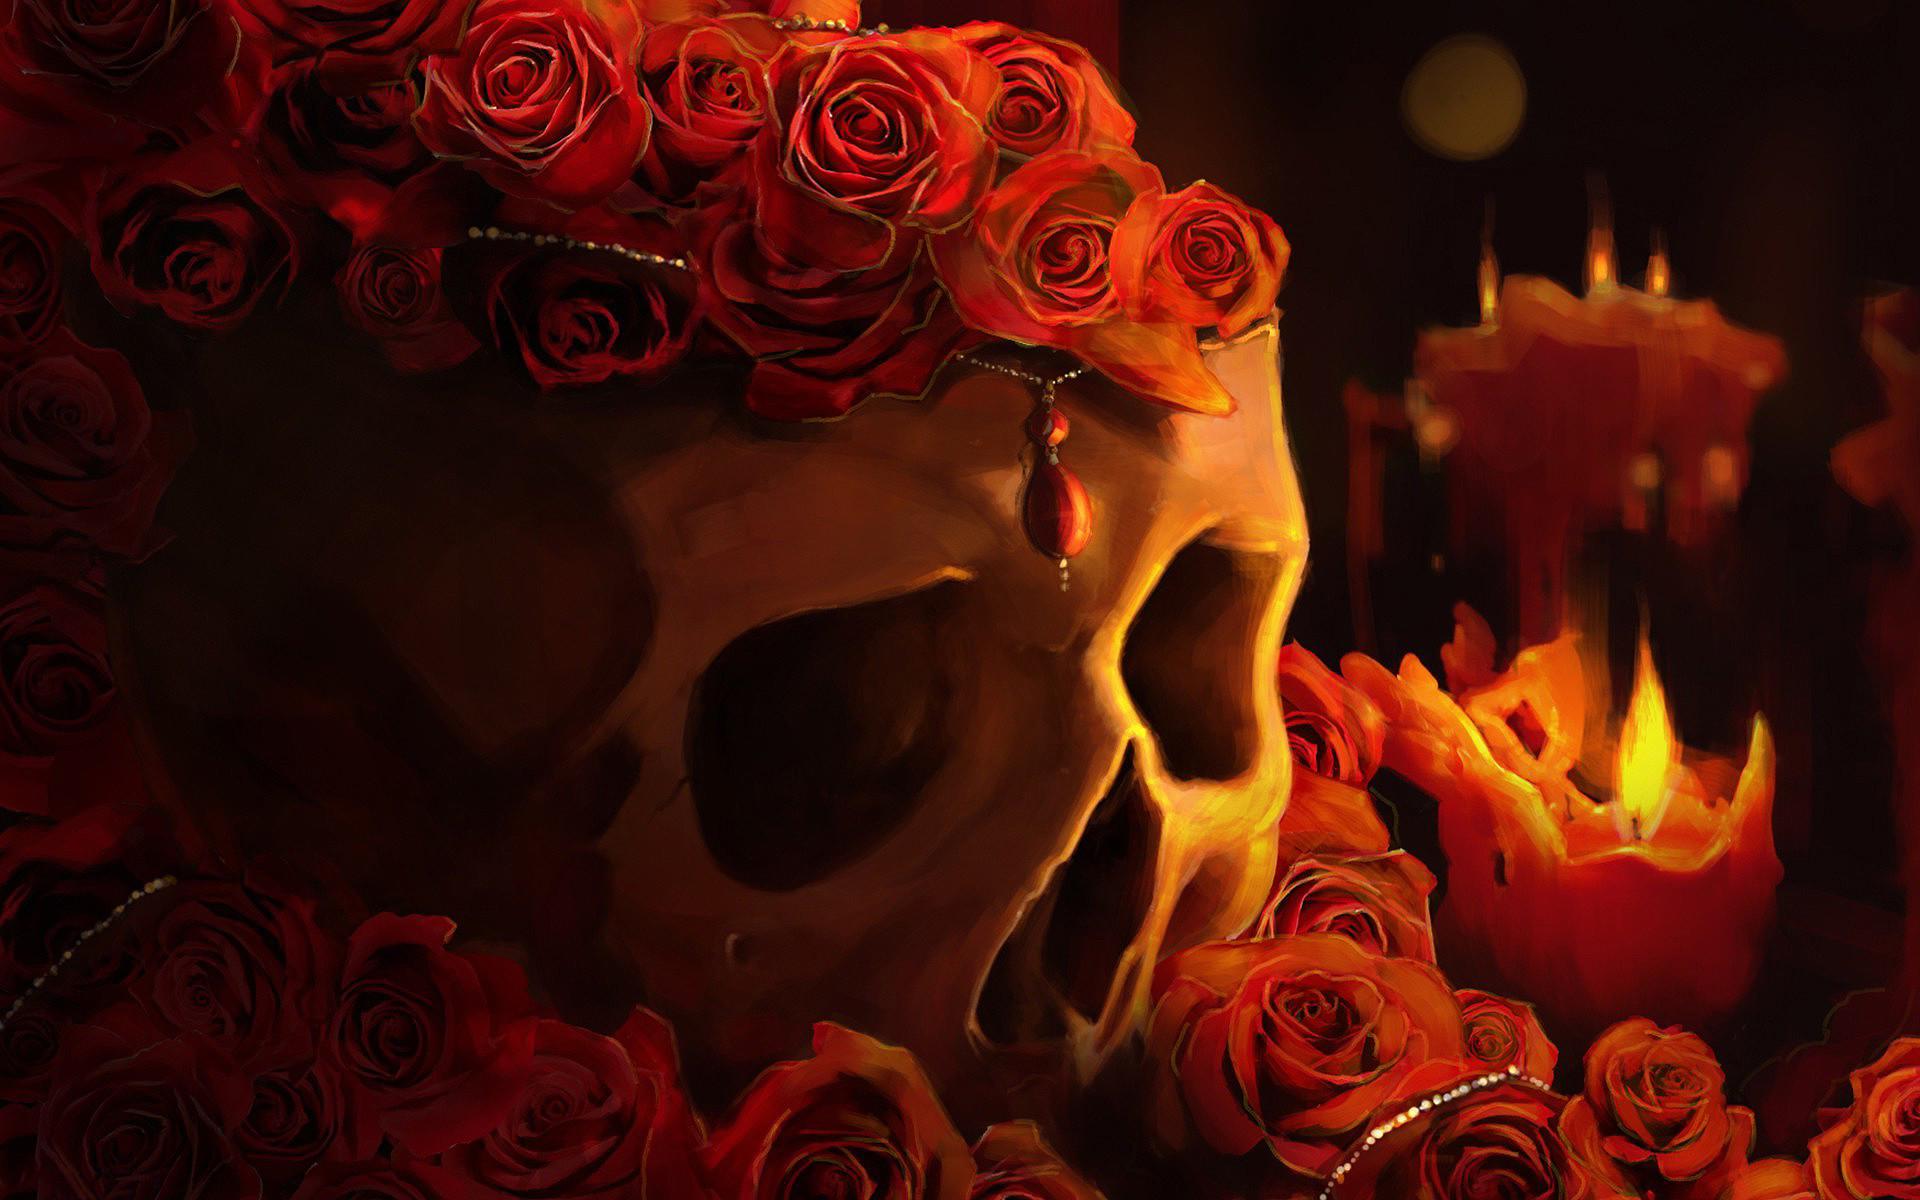 Red Roses Skull Wallpapers – https://hdwallpapersf.com/red-roses